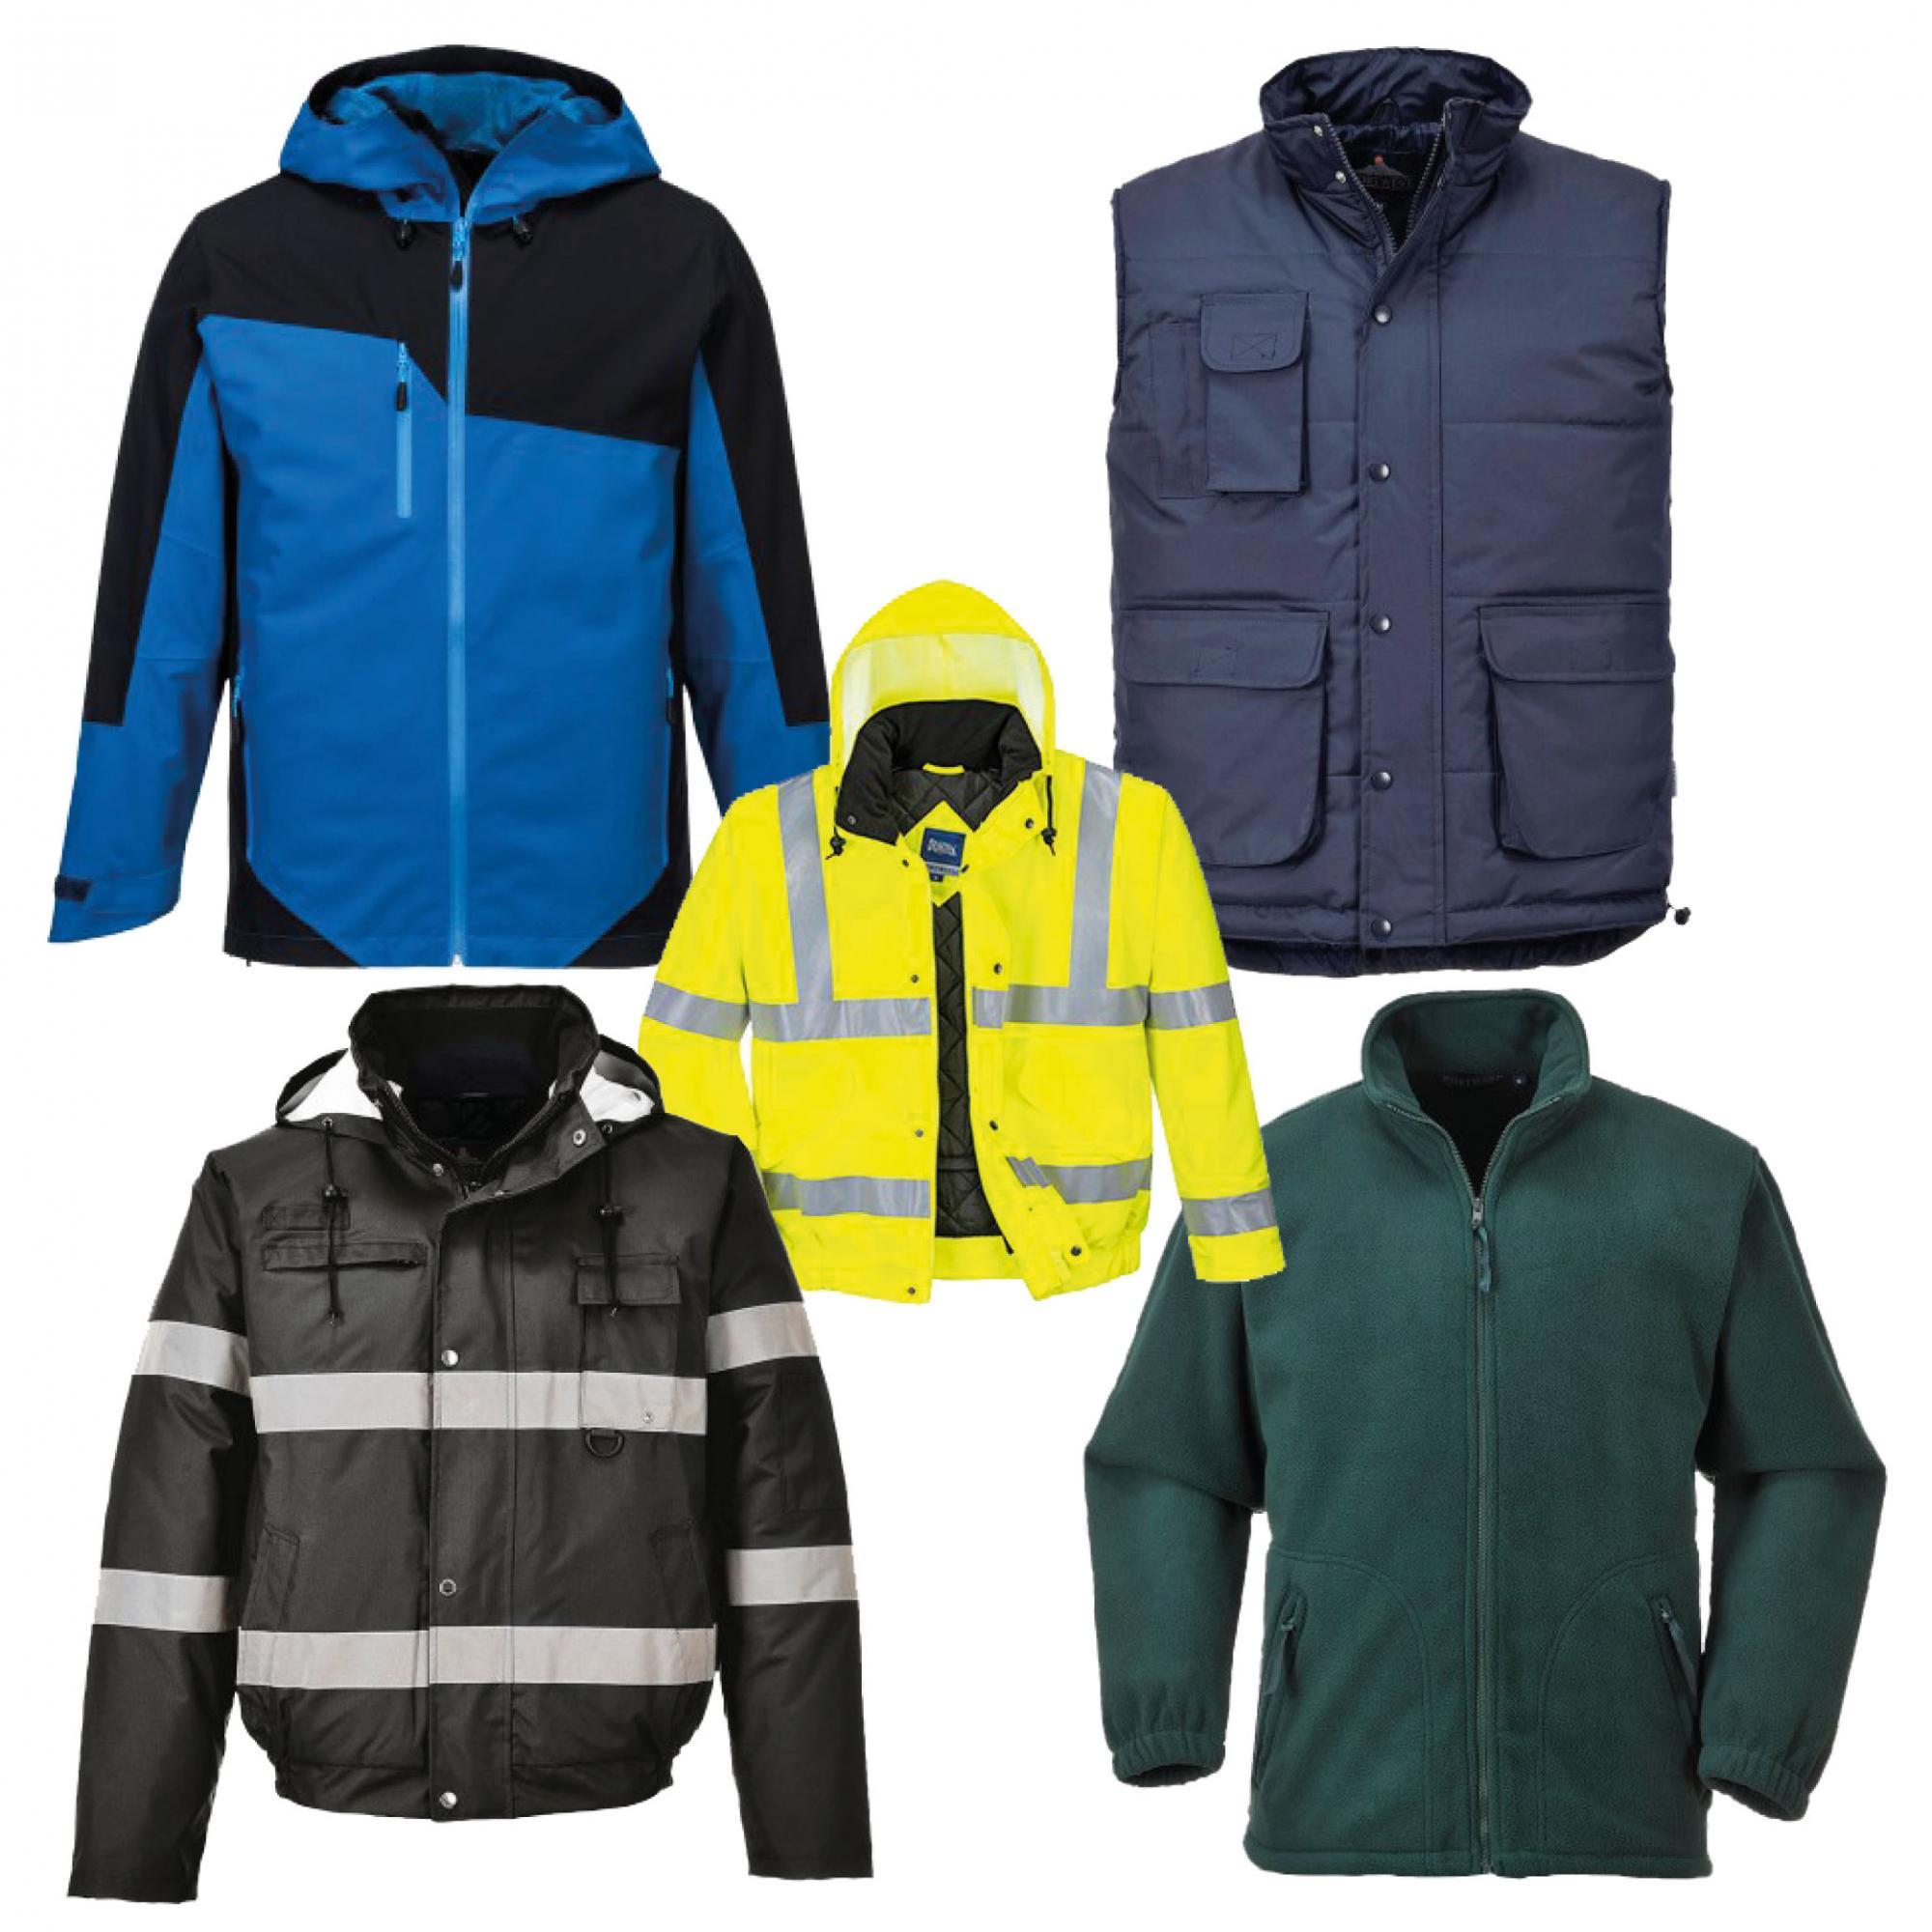 Jackets & Outerwear